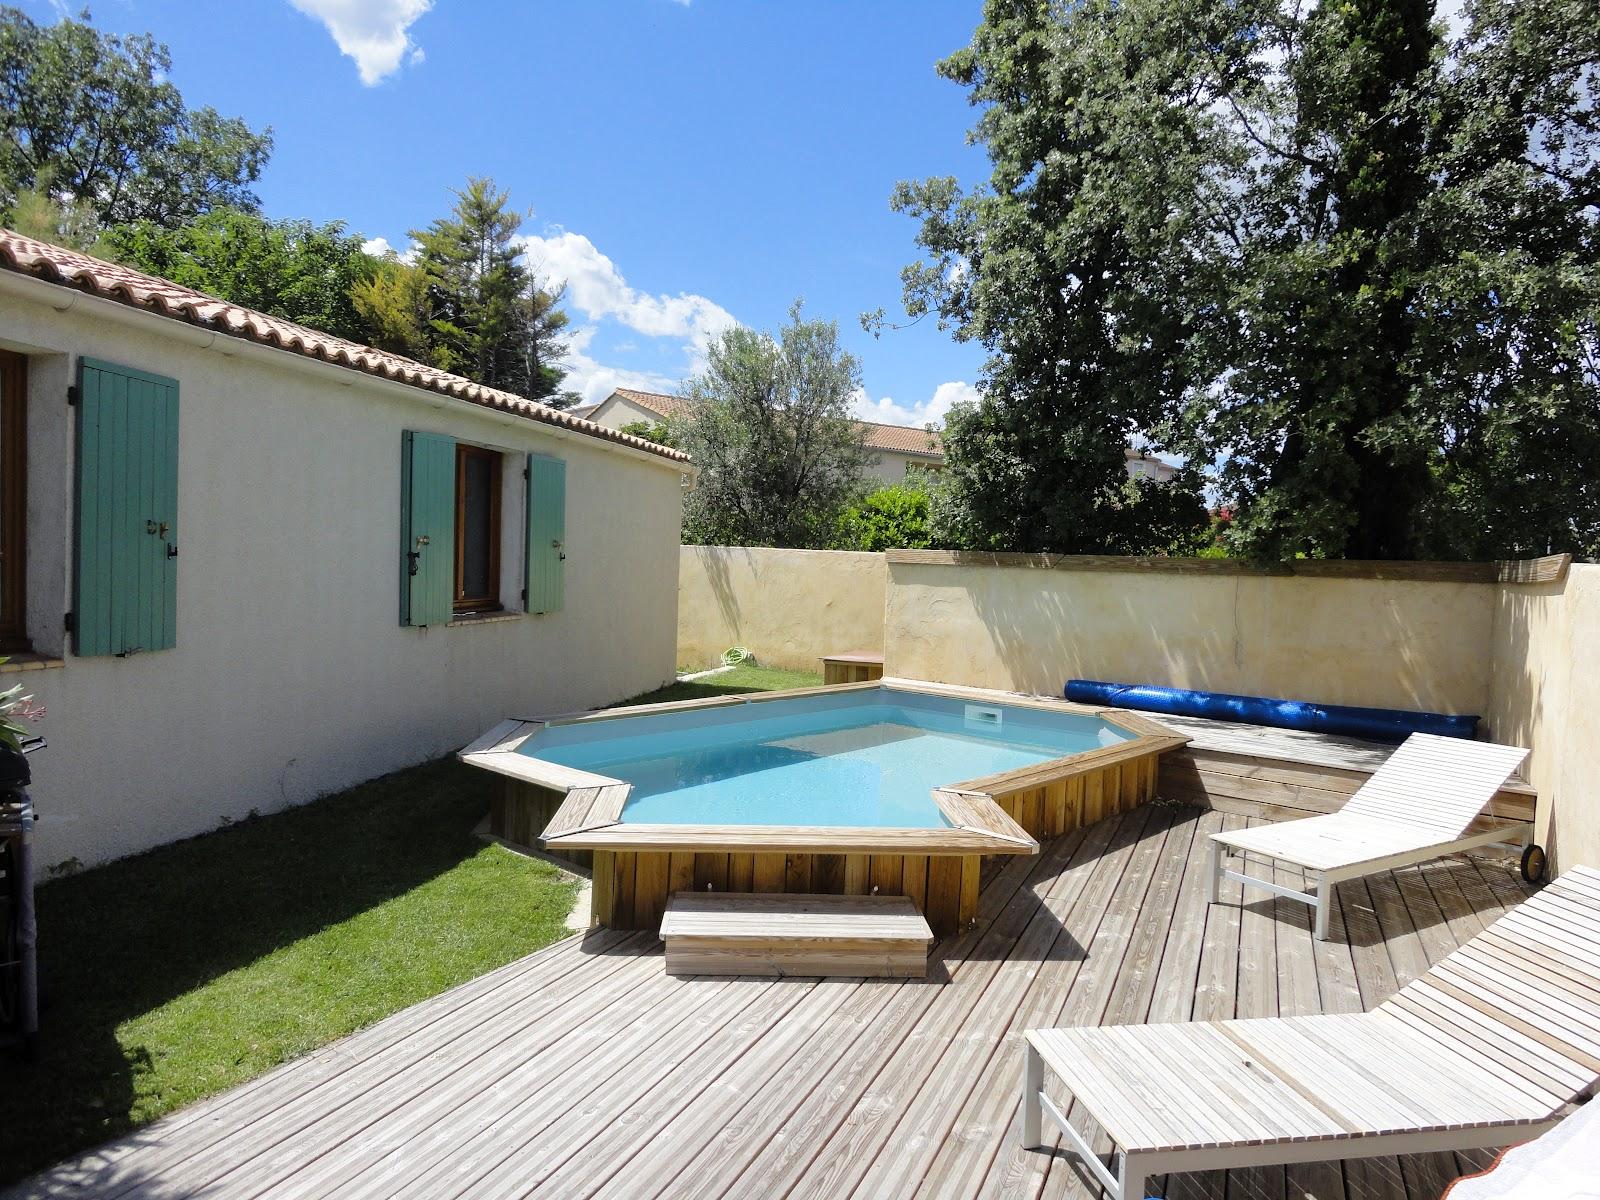 a vendre jolie maison avignon terrain 535m2 taxe fonci re taxe habitation 1000 euros 2 coins. Black Bedroom Furniture Sets. Home Design Ideas